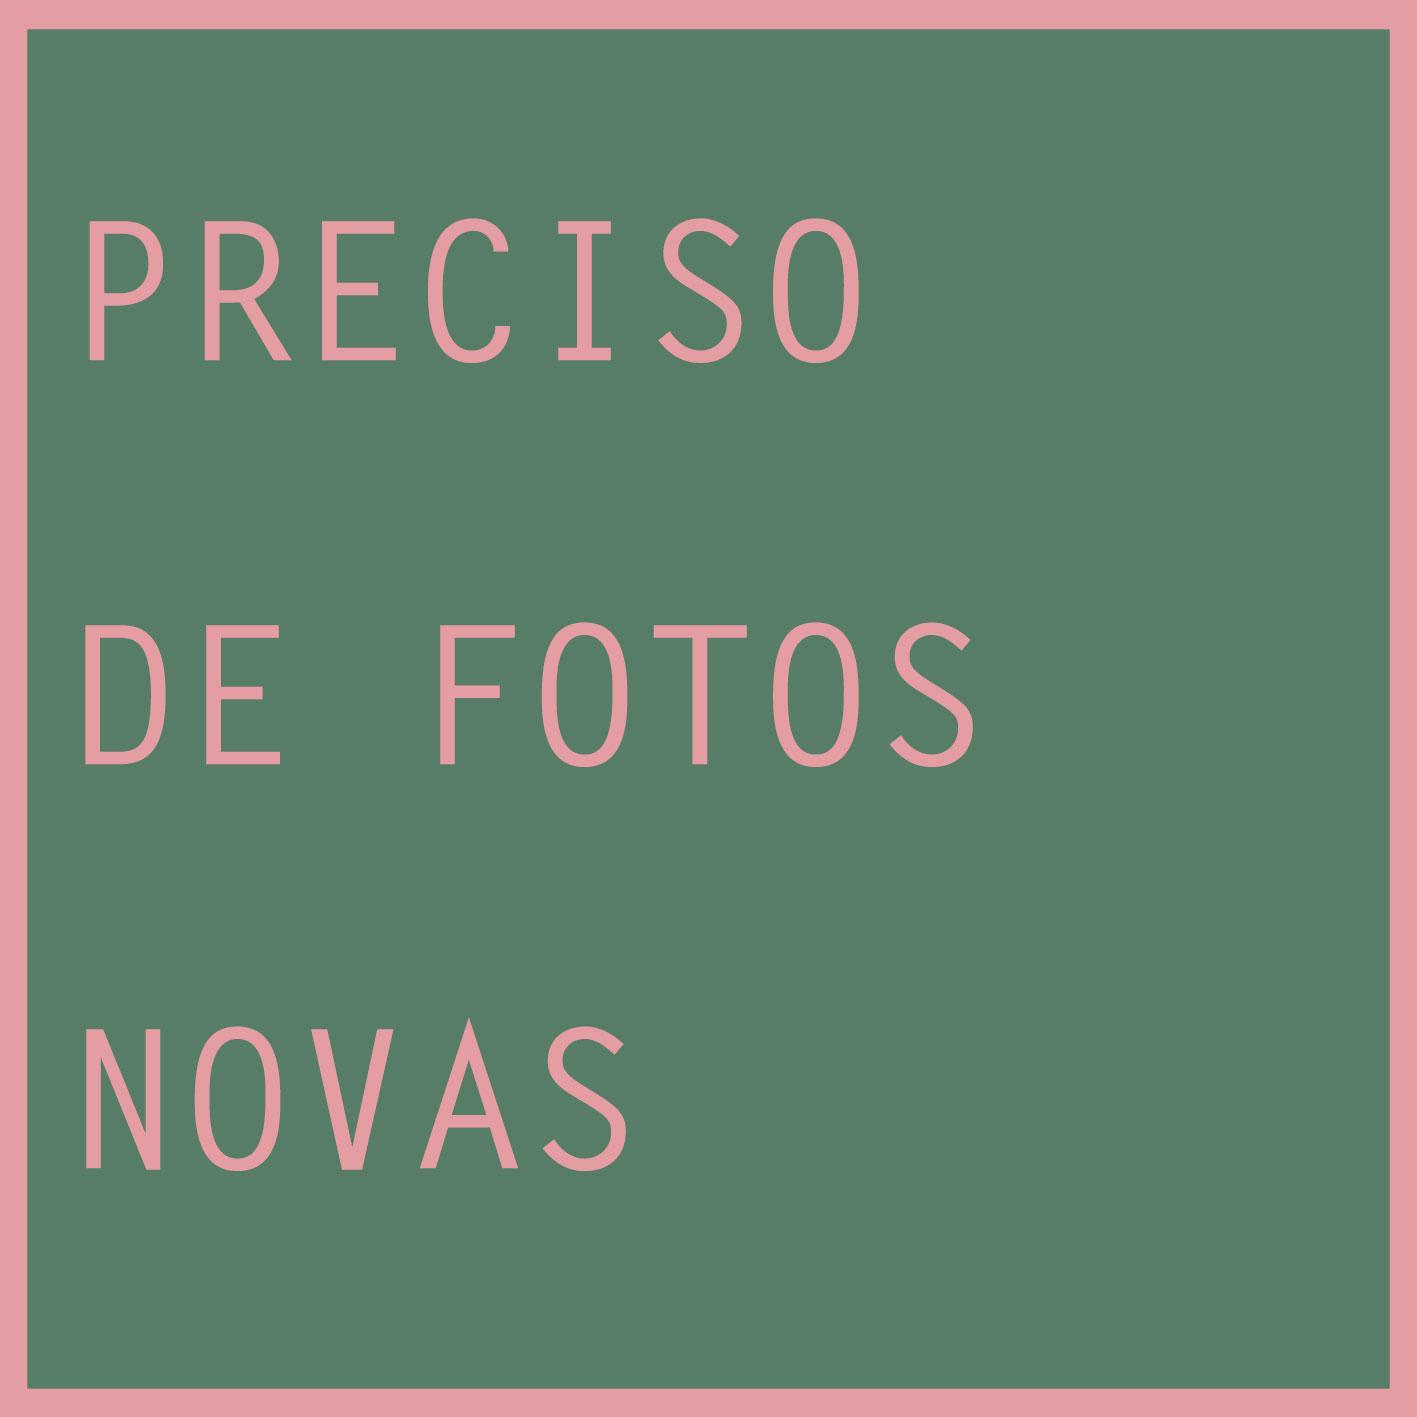 bia-tabosa-FOTOS.jpg